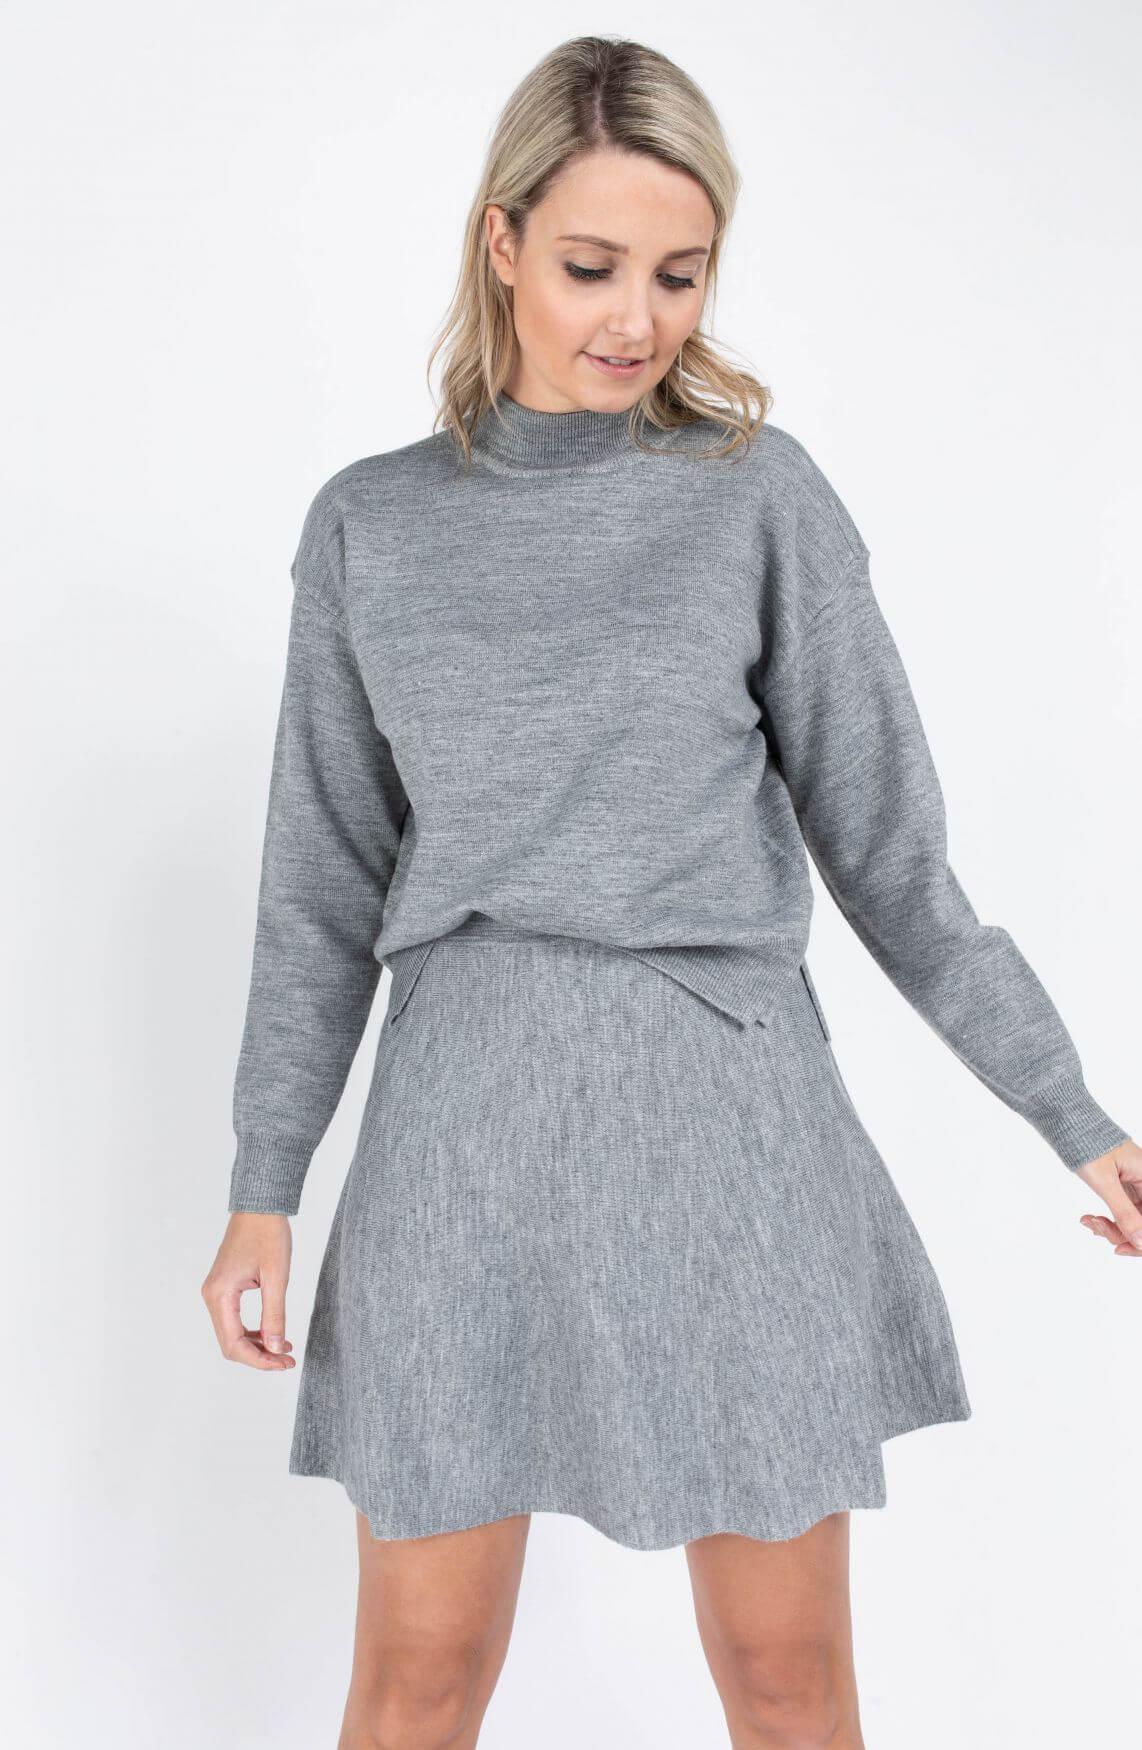 Nümph Dames Nupillywooli pullover Grijs